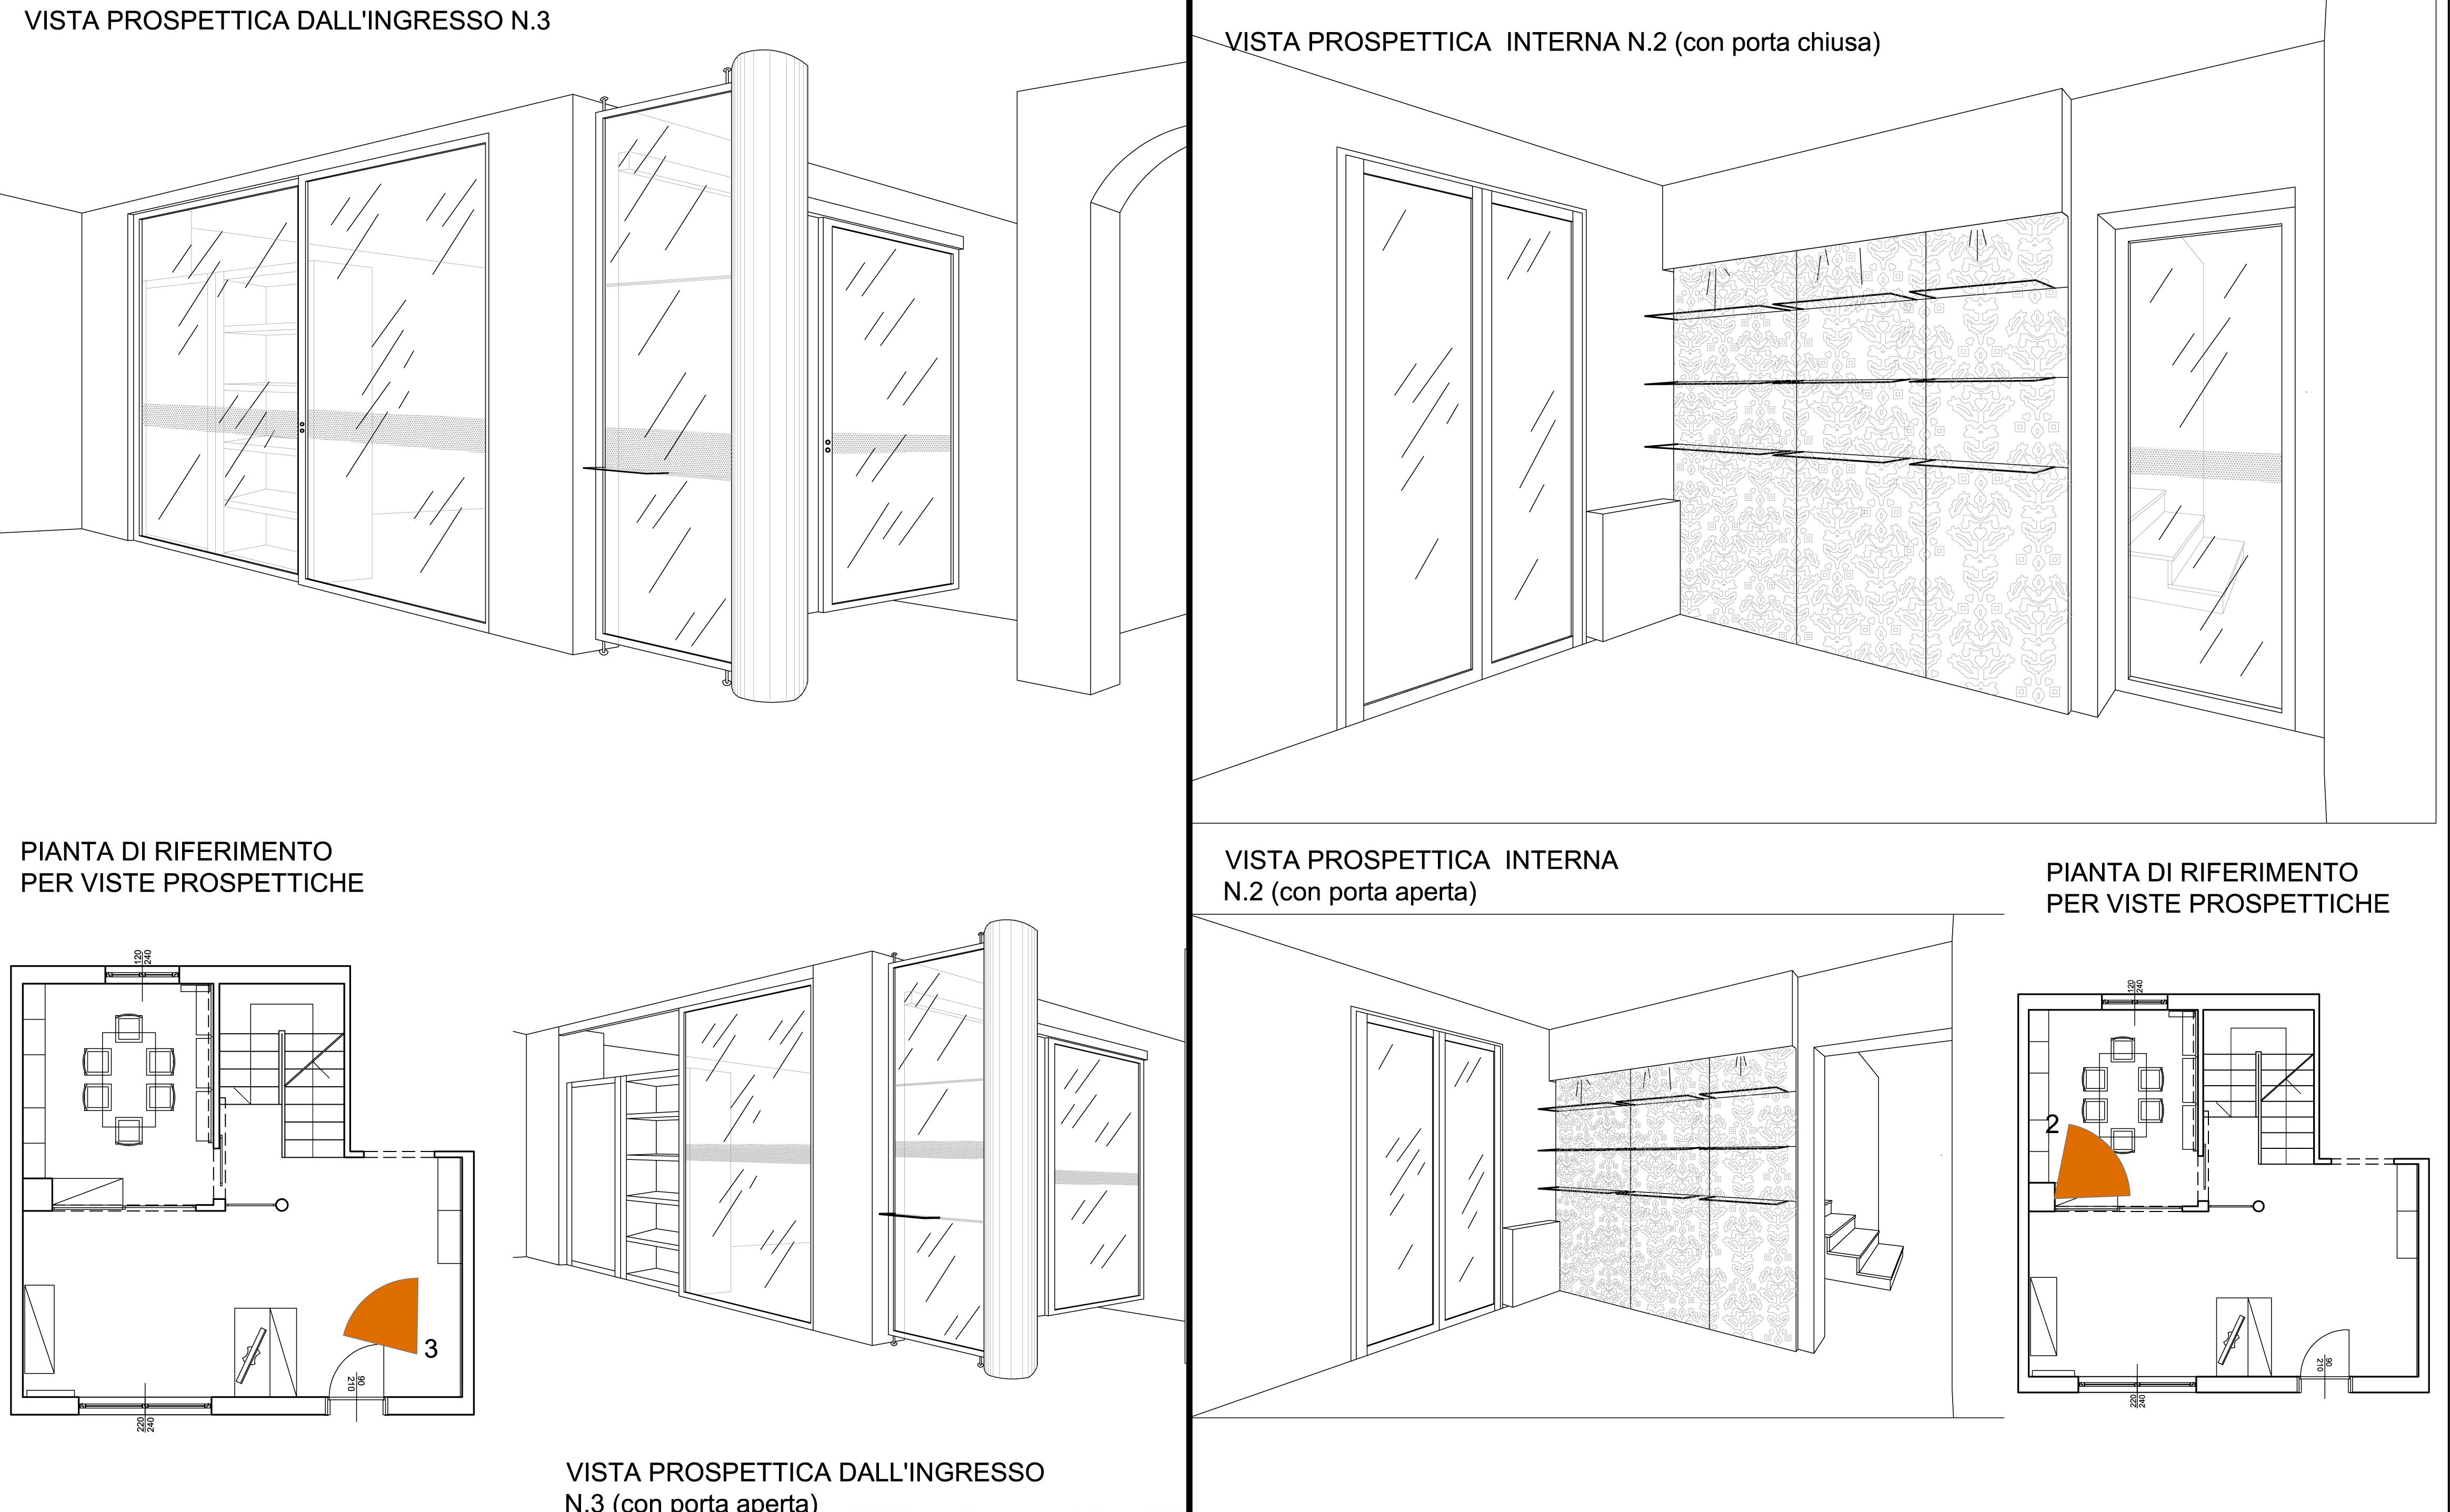 D:vanynegozioprogettiferrazziferrazzi.dwg proposta2 (1)